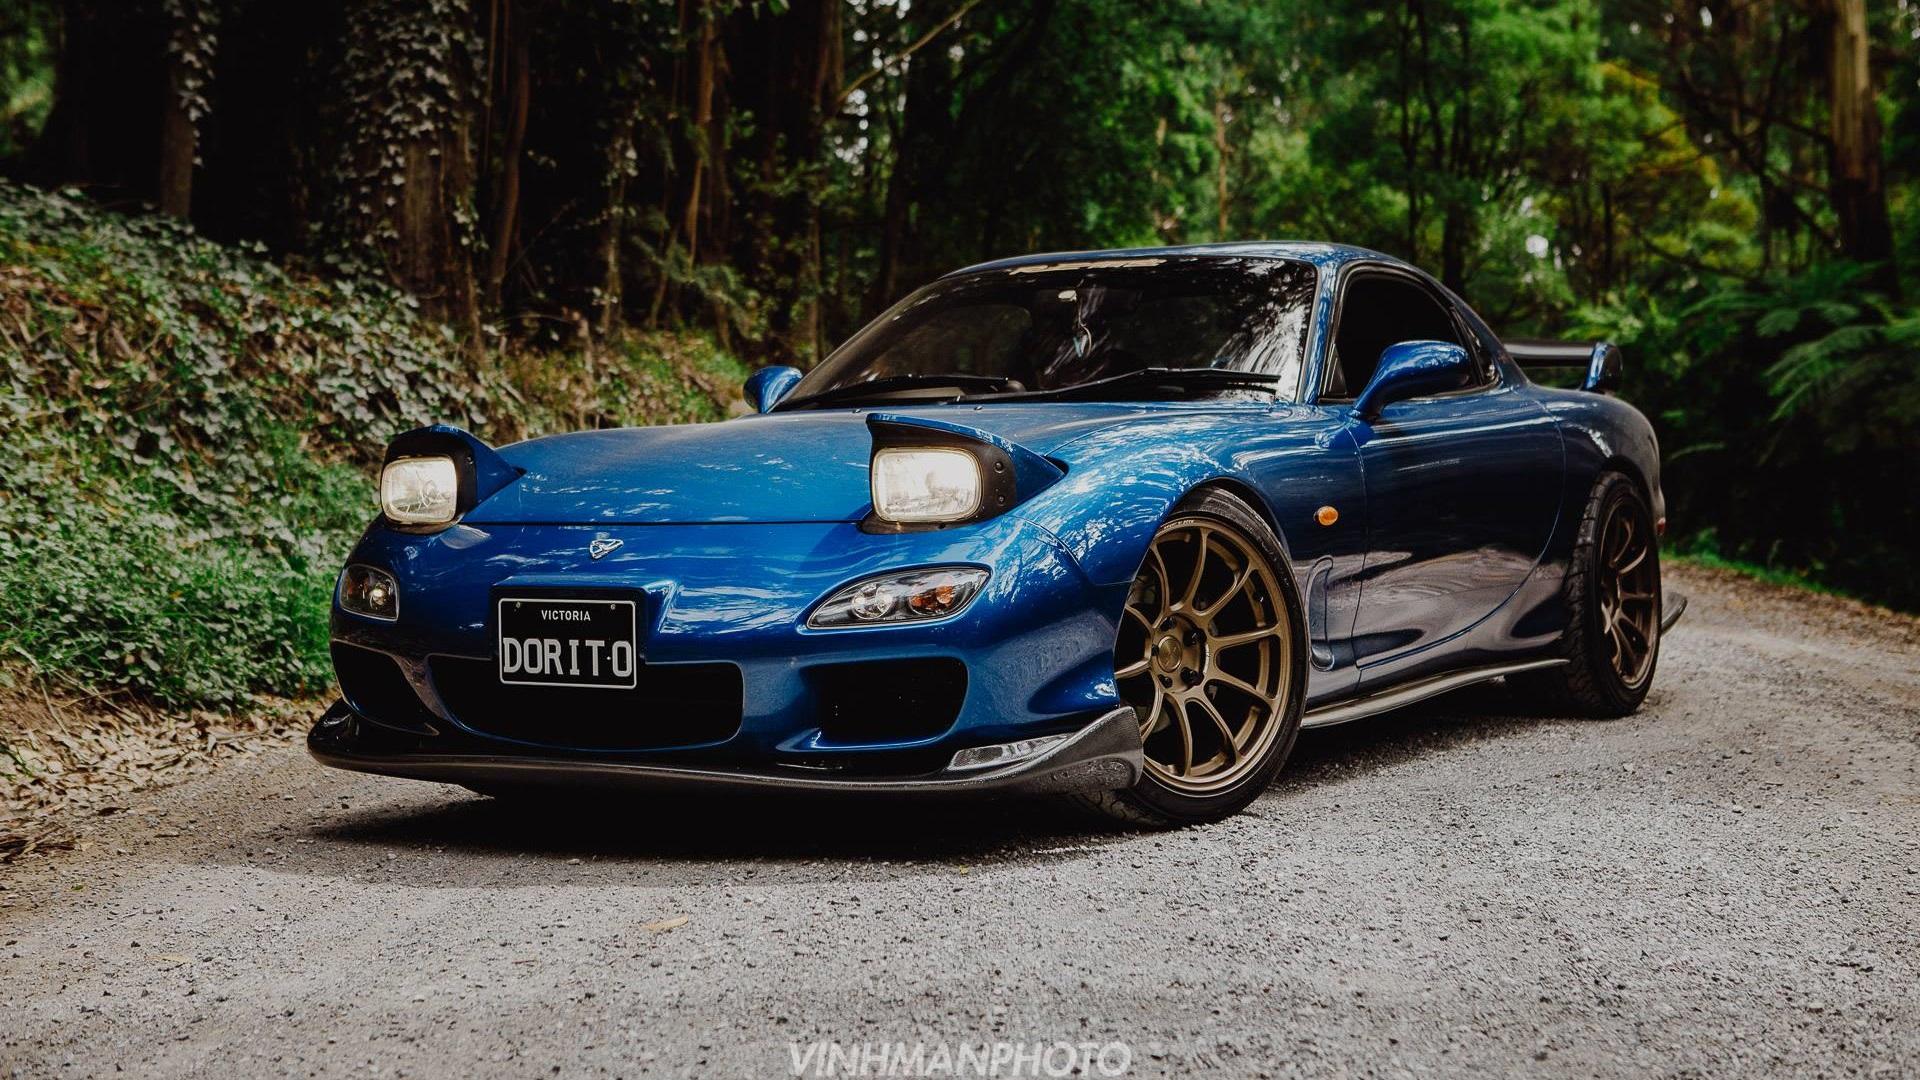 Mazda RX-7 FD, JDM, Japanese cars, sports car, Mazda, blue ...